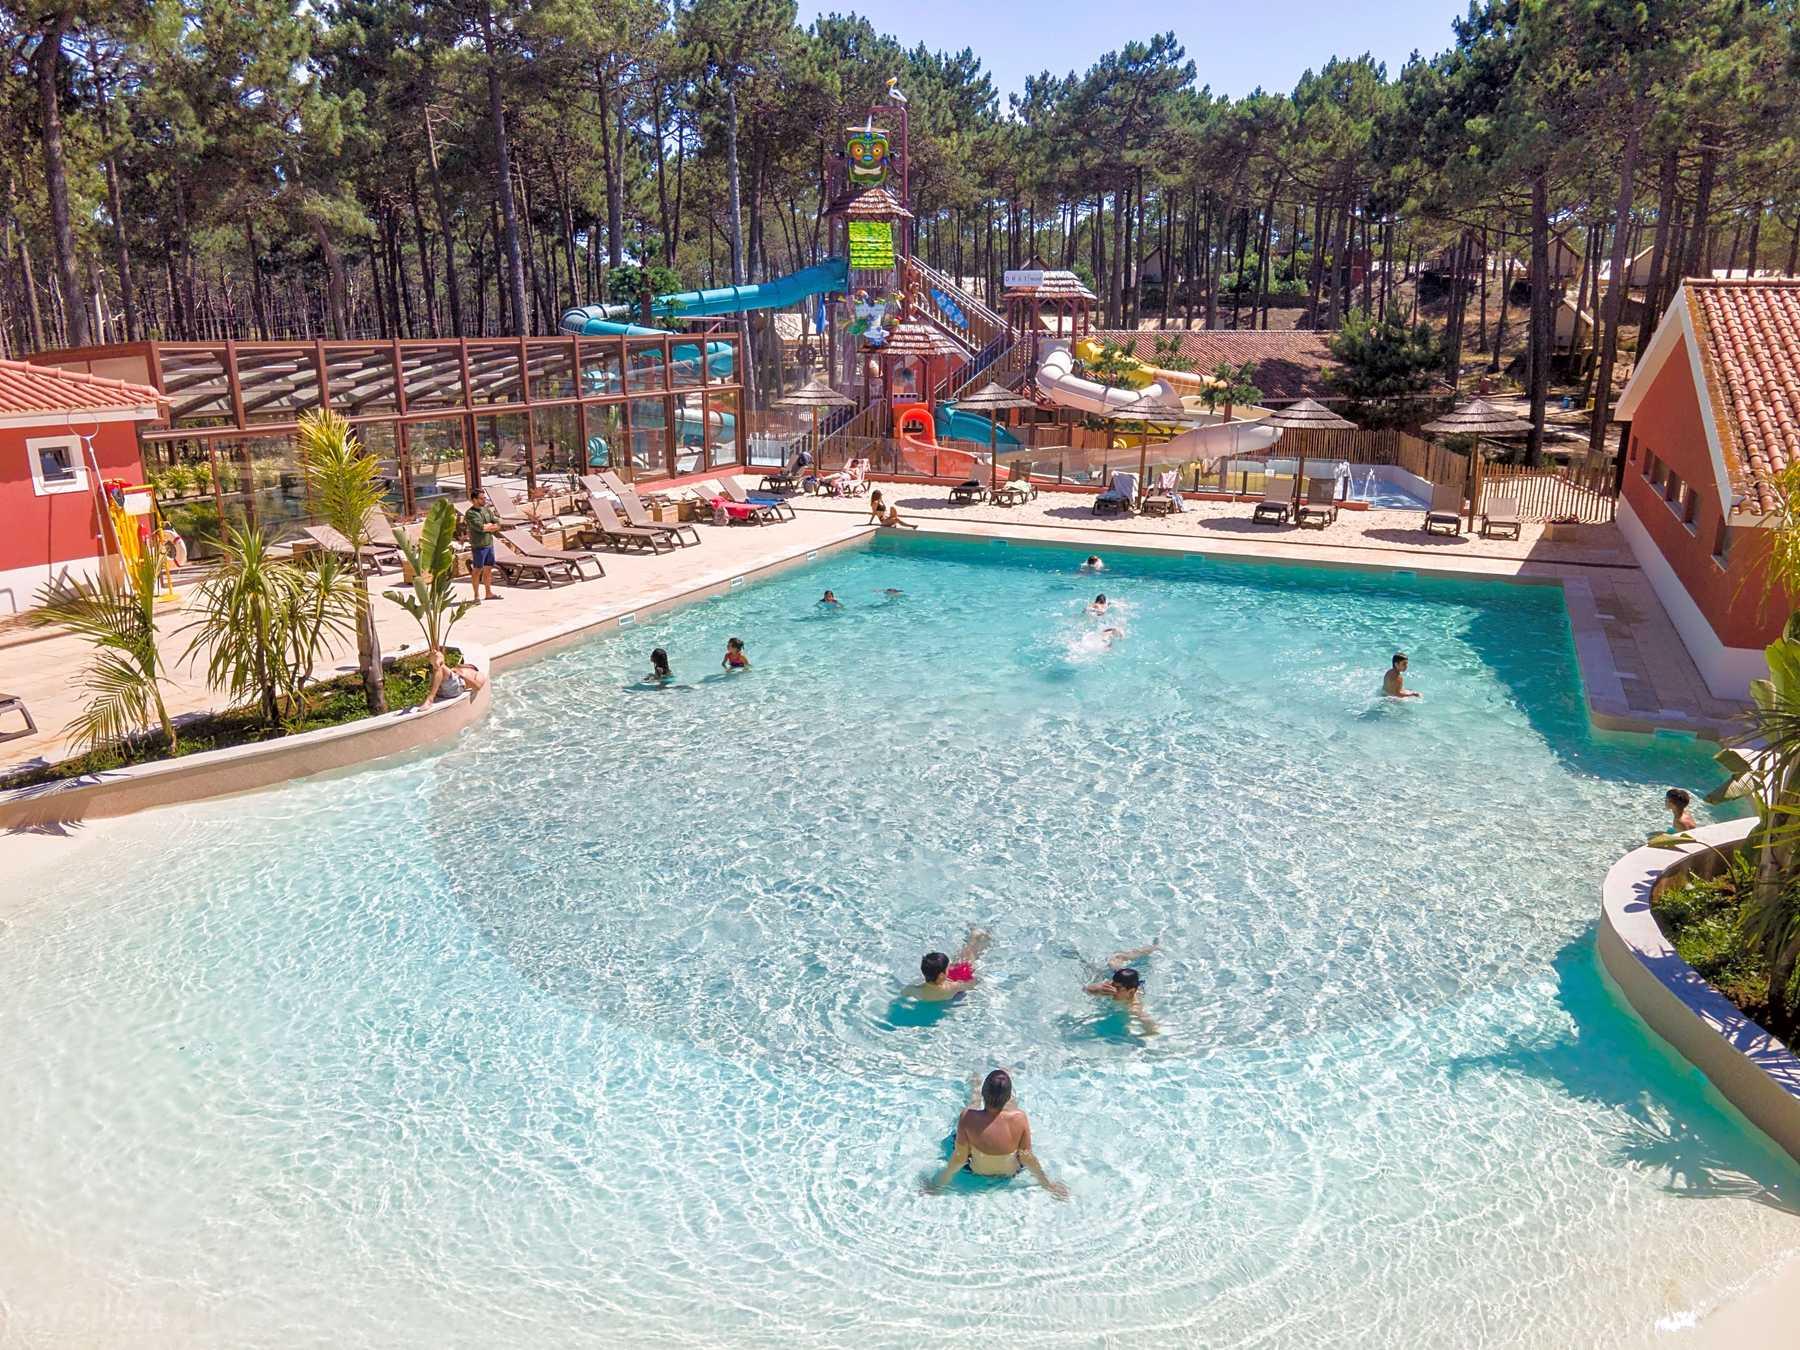 Inspirebox_ohai nazare resort outdoor_8